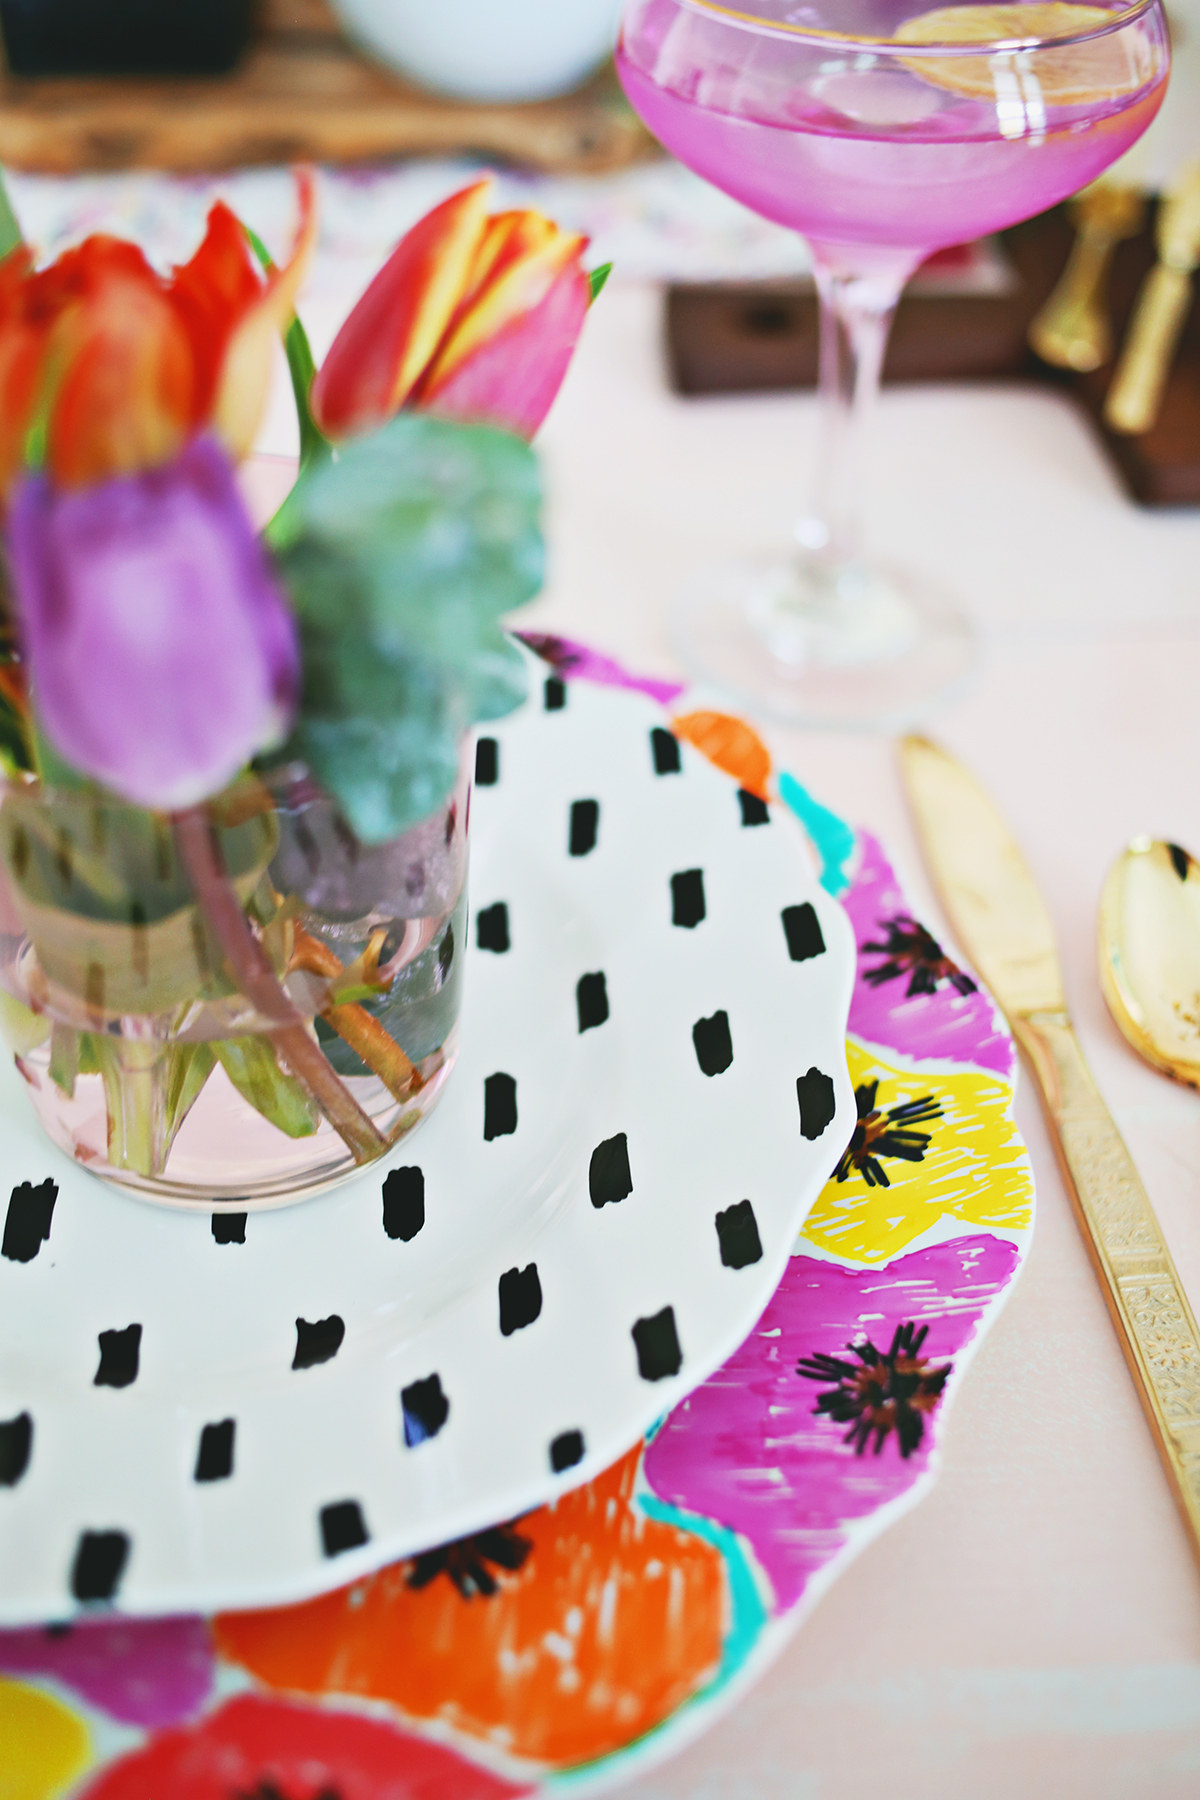 صور اطباق وصحون تقديم ملونة وسادة مودرن شيك (8)